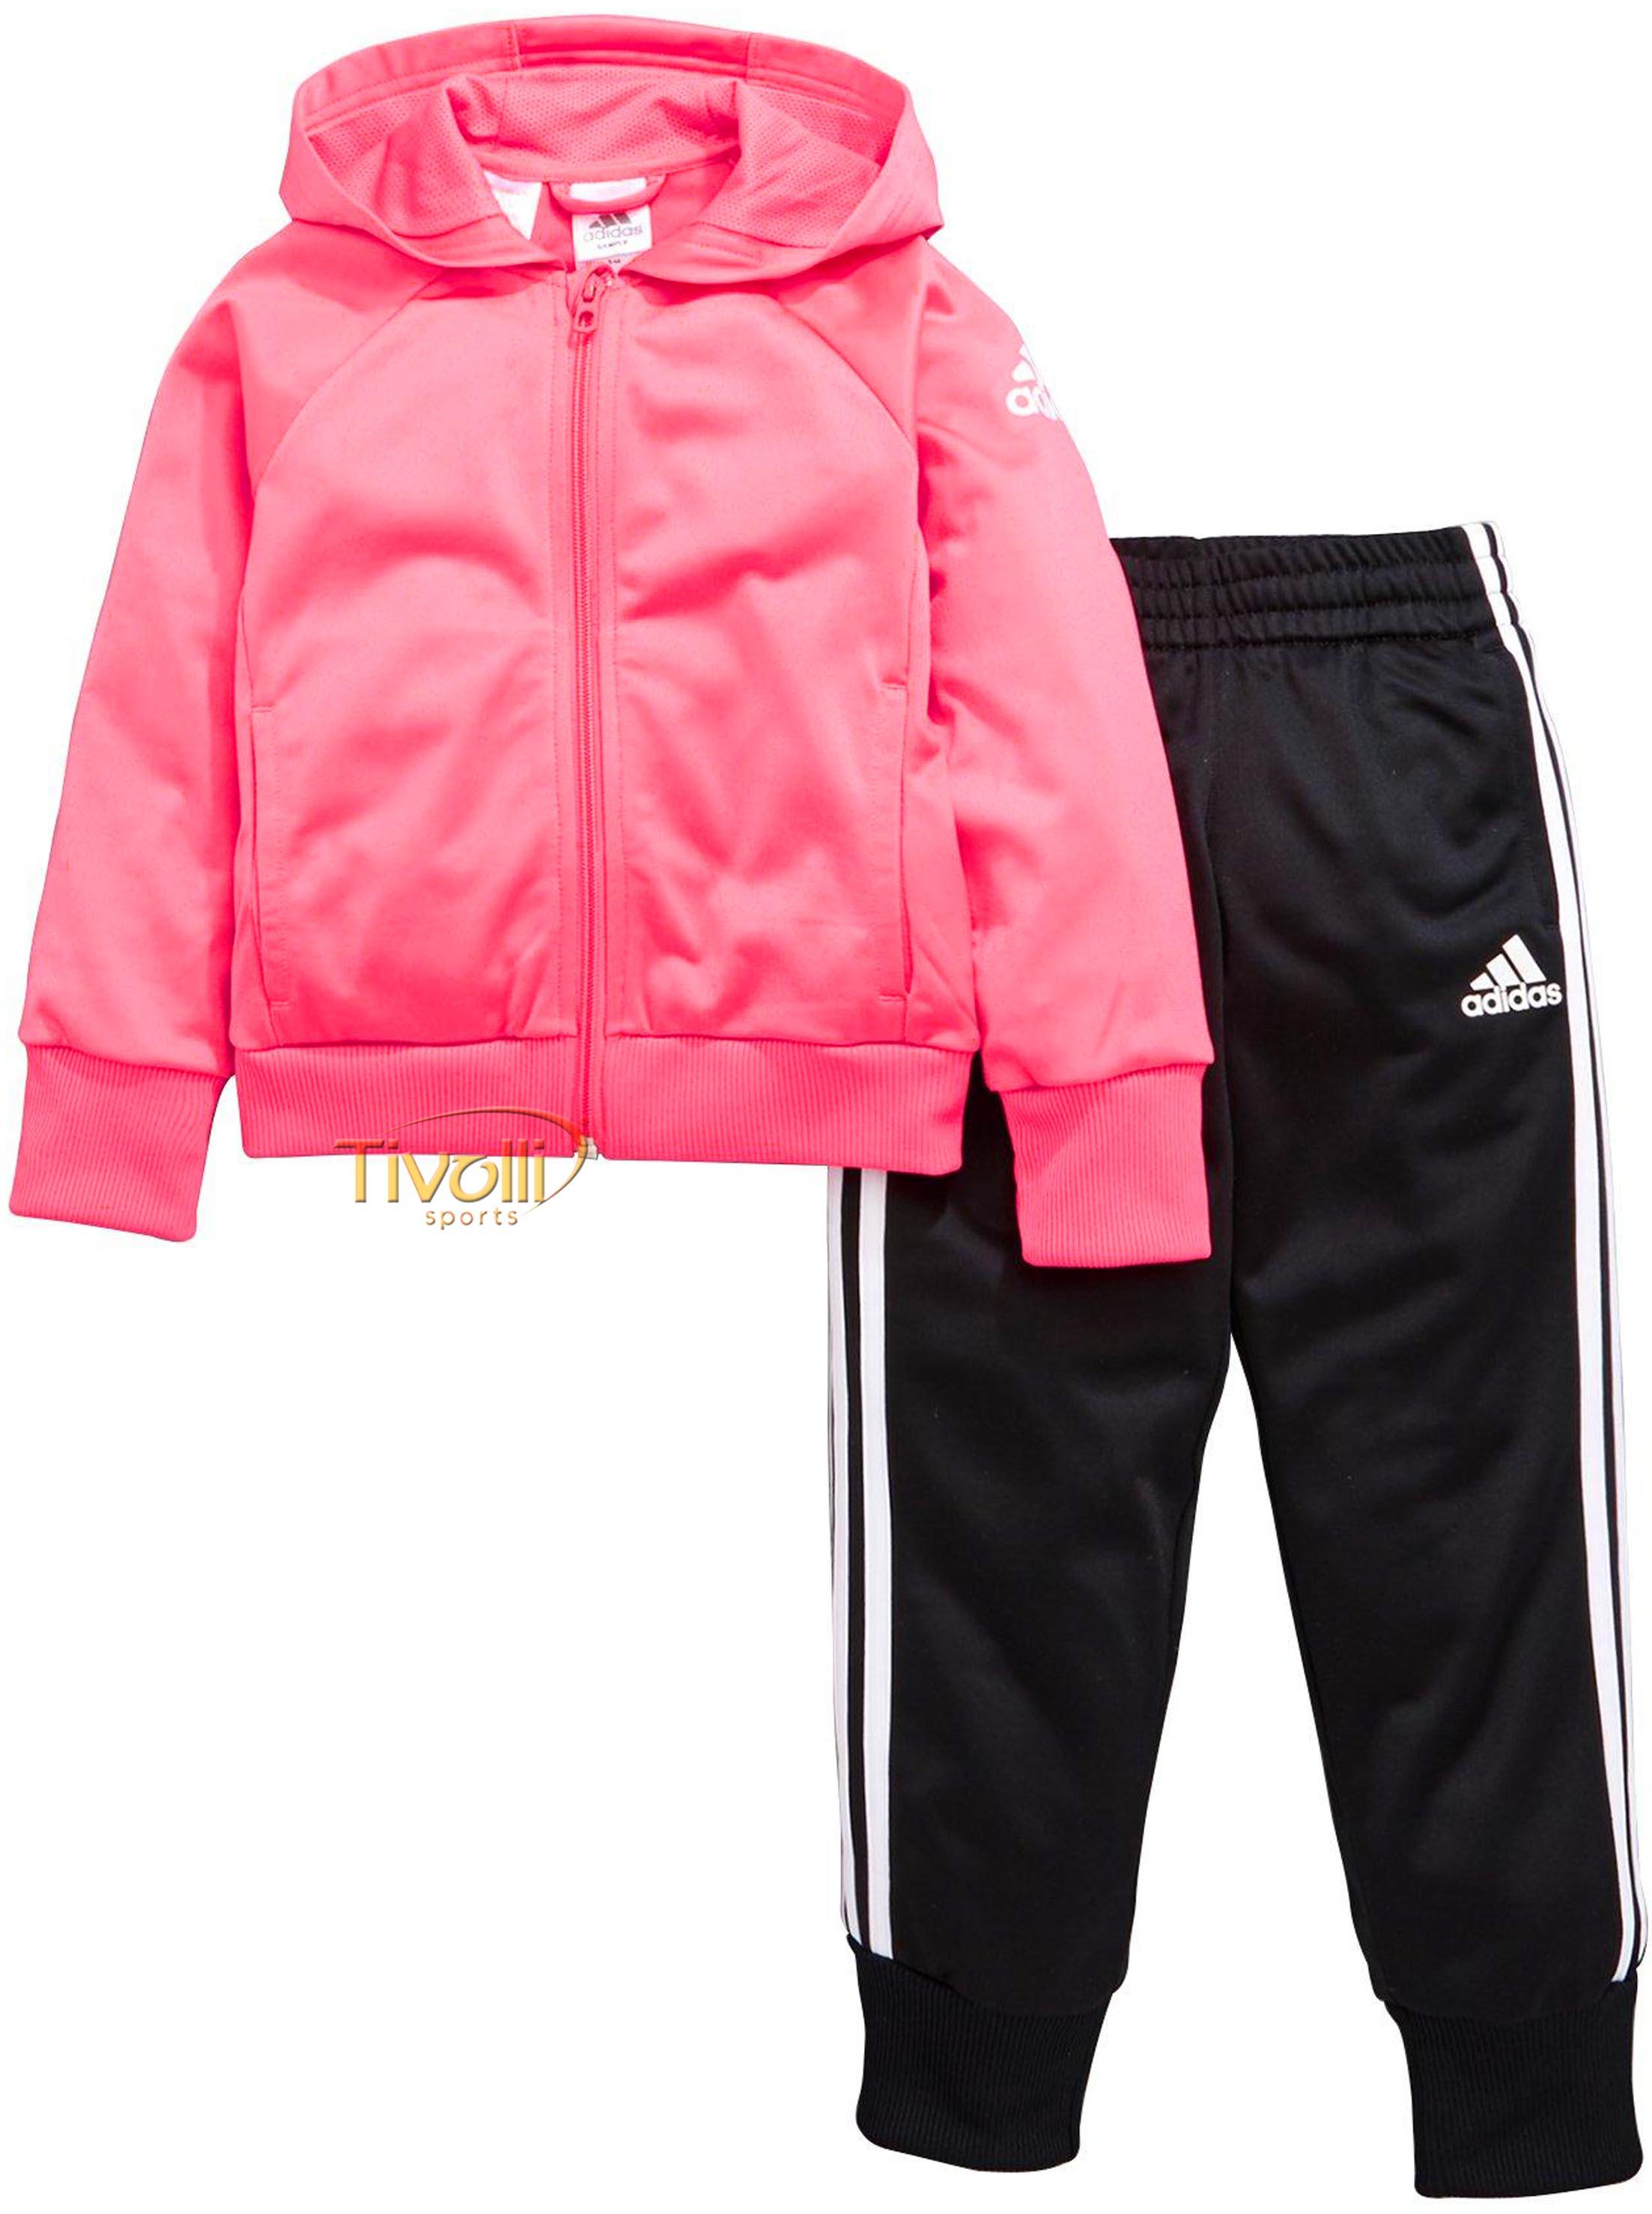 306ebb34010 Raquete Mania   Agasalho Adidas LG KN Tracksuit Infantil   Rosa ...